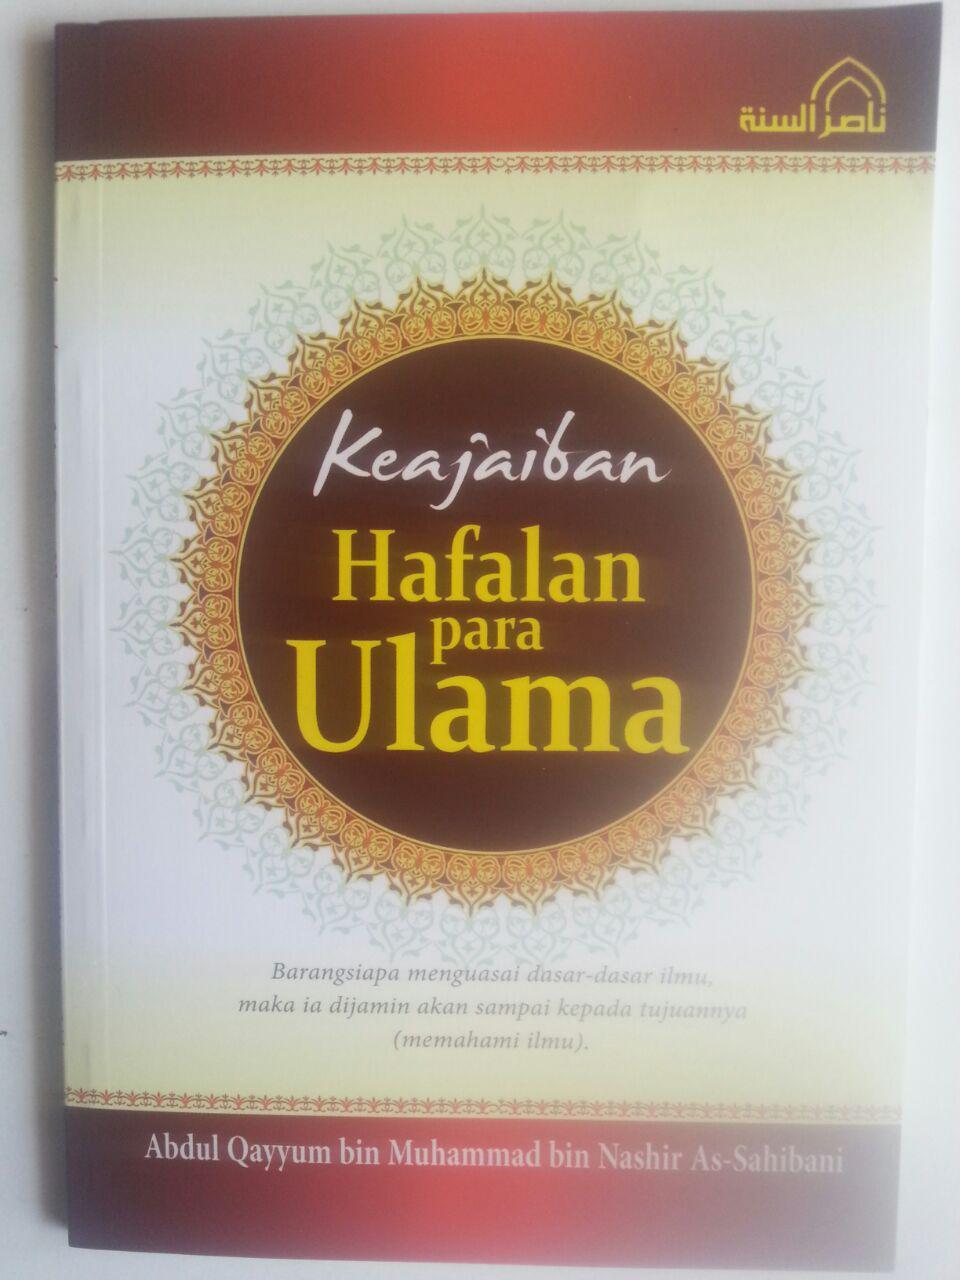 Buku Keajaiban Hafalan Para Ulama cover 2